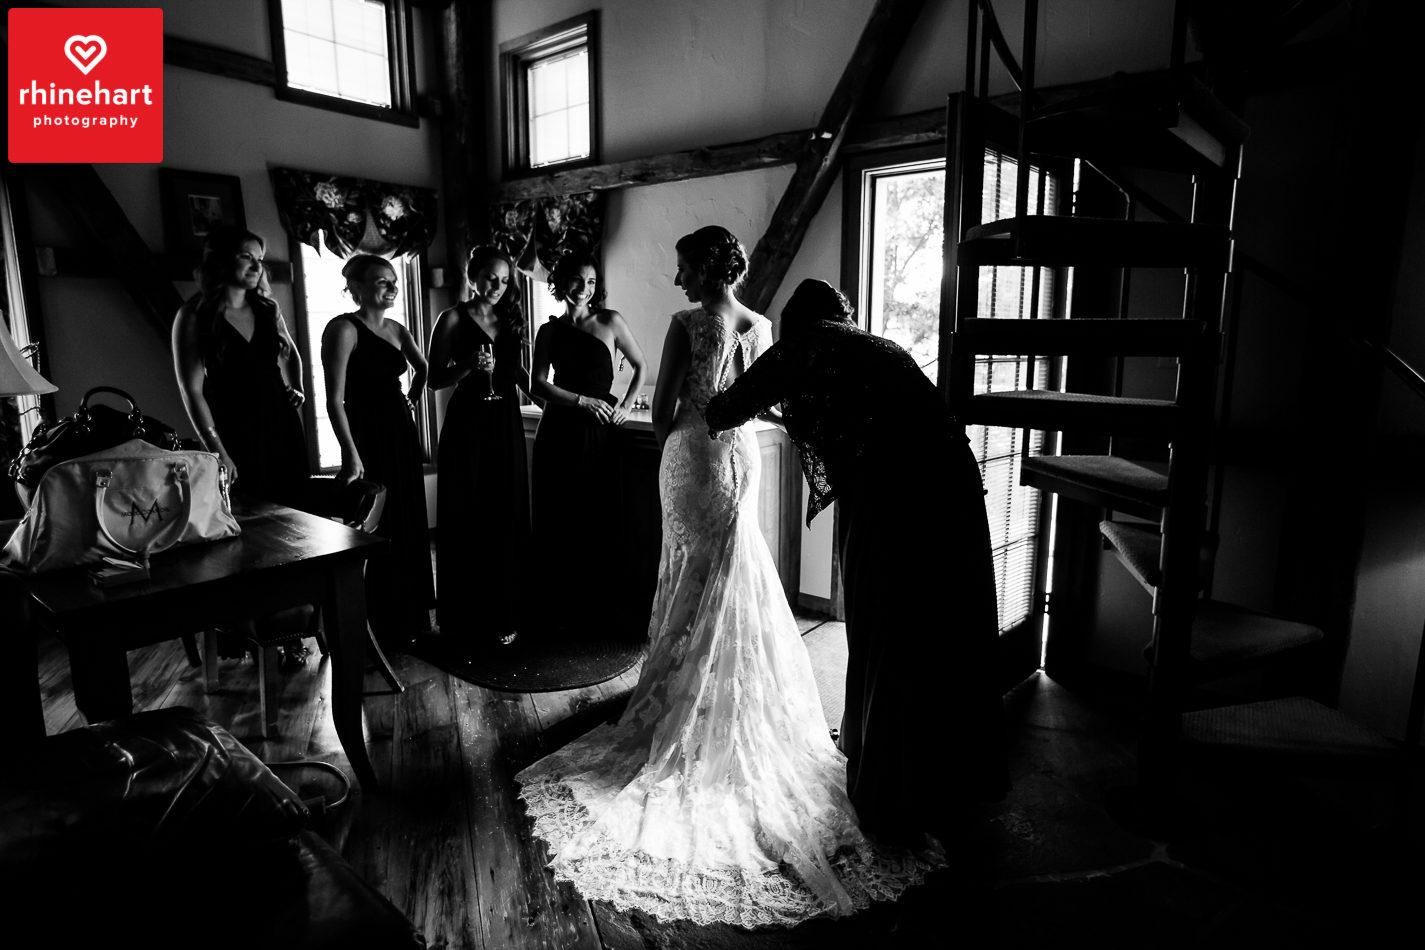 glasbern-inn-wedding-photographer-210